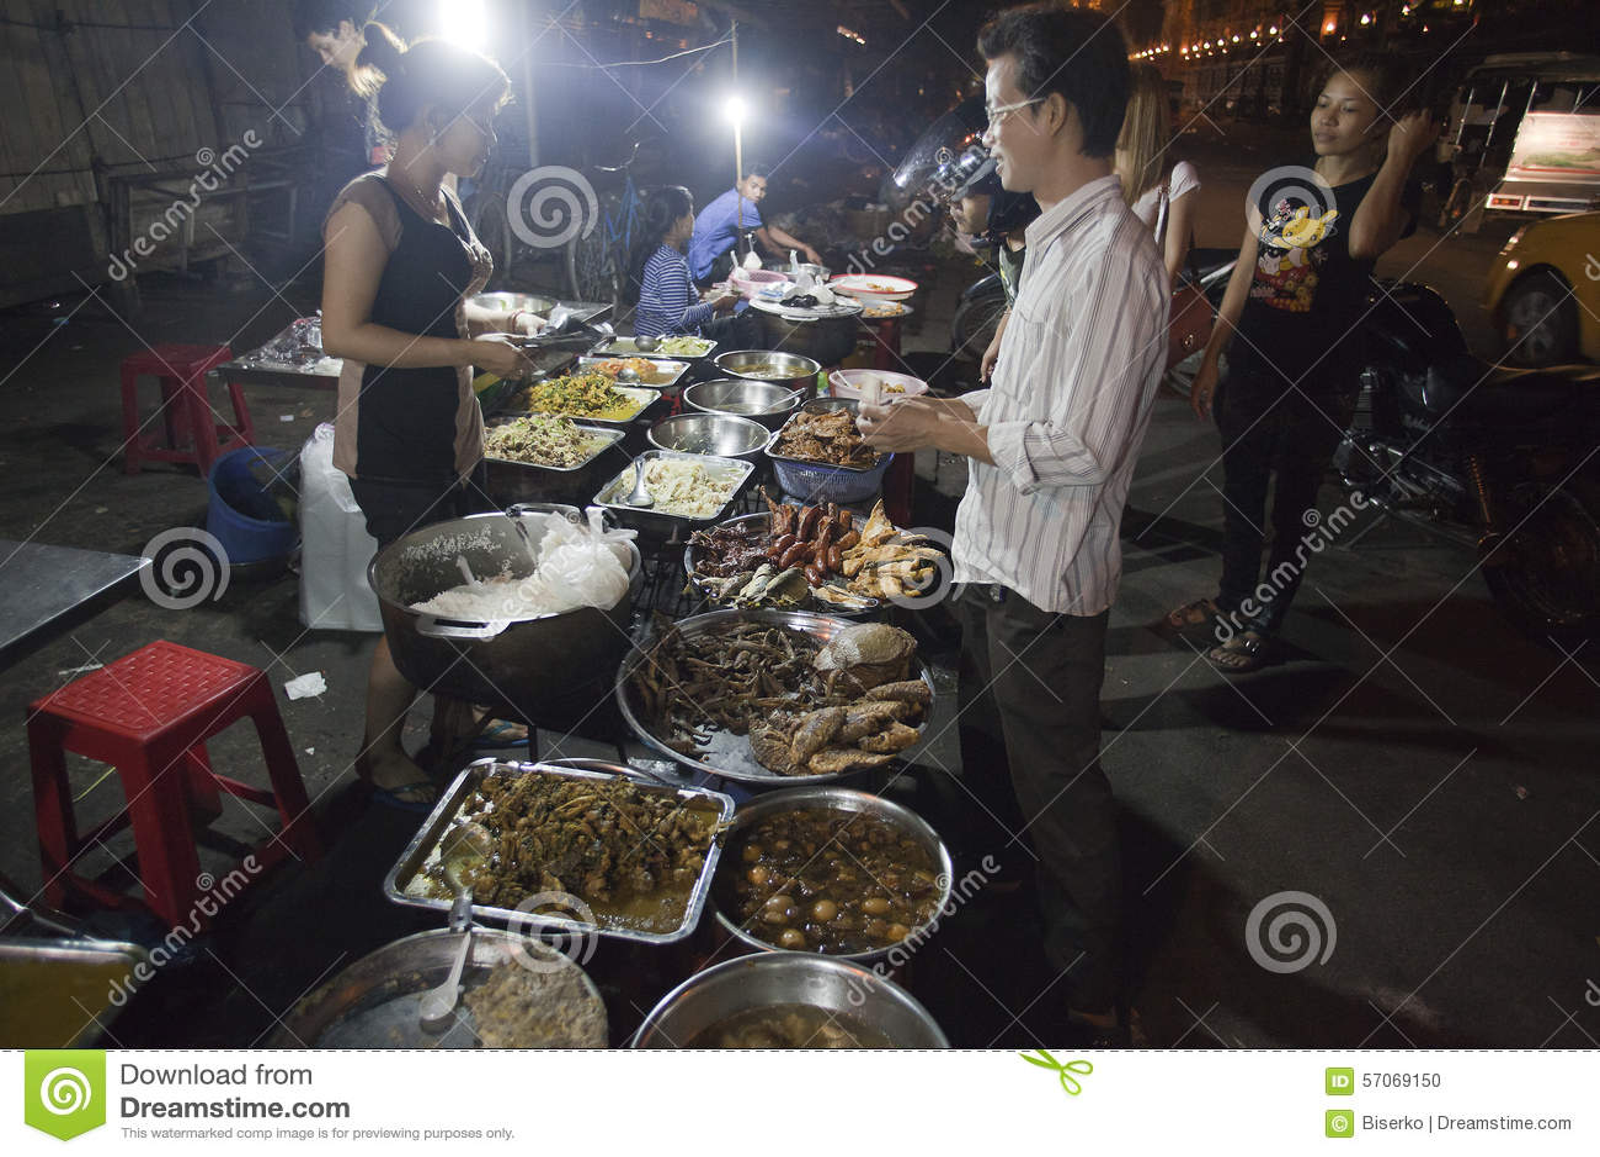 kitchen booths ninja mega 1500 夜摊位在金边编辑类图片 图片包括有出售 厨房 承办酒席 咖喱 烹调 夜摊位在金边